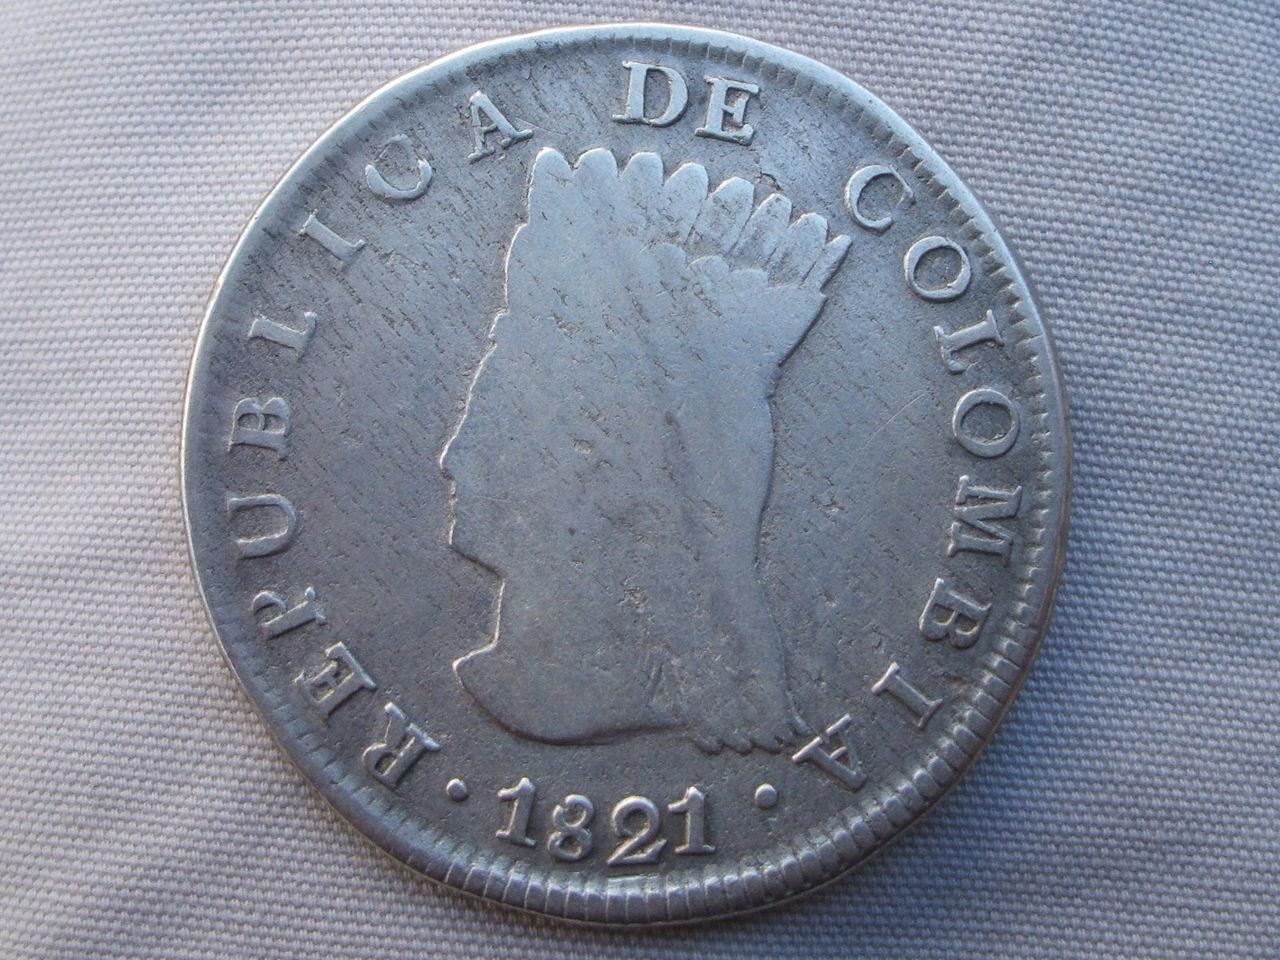 cundinamarca - 8 Reales. Colombia. 1821. Cundinamarca Si_2